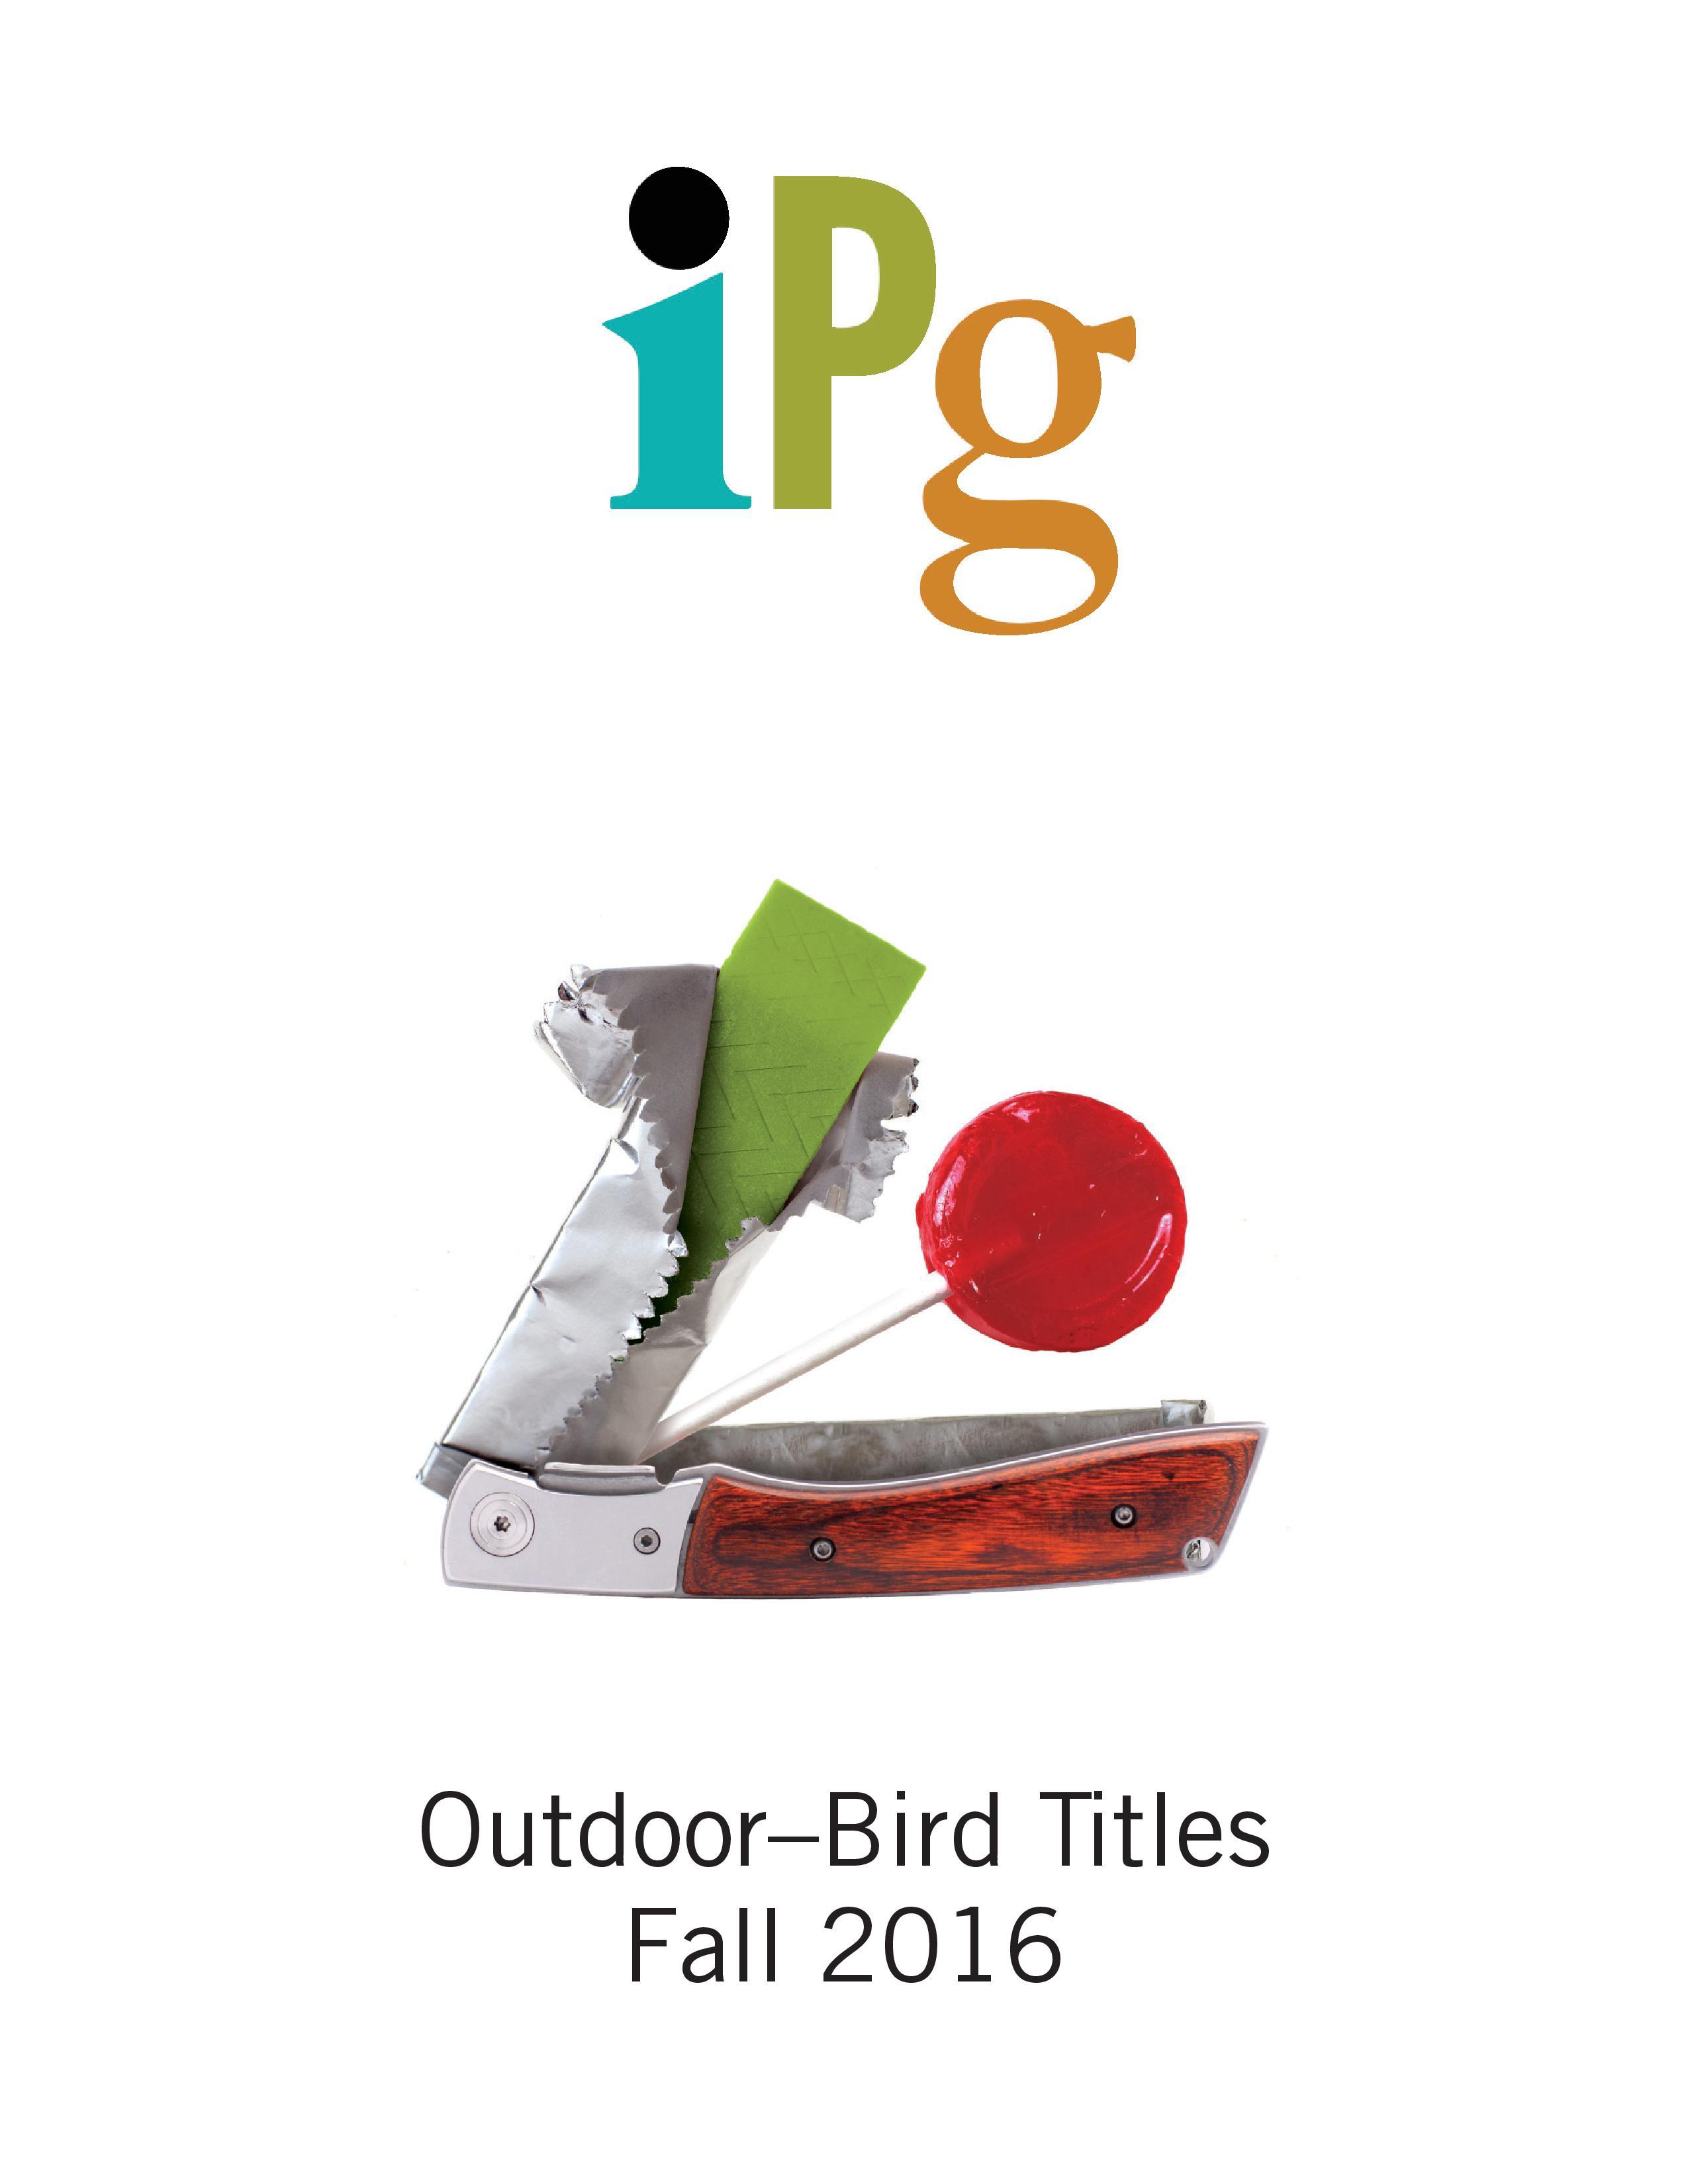 Outdoor - Bird Titles